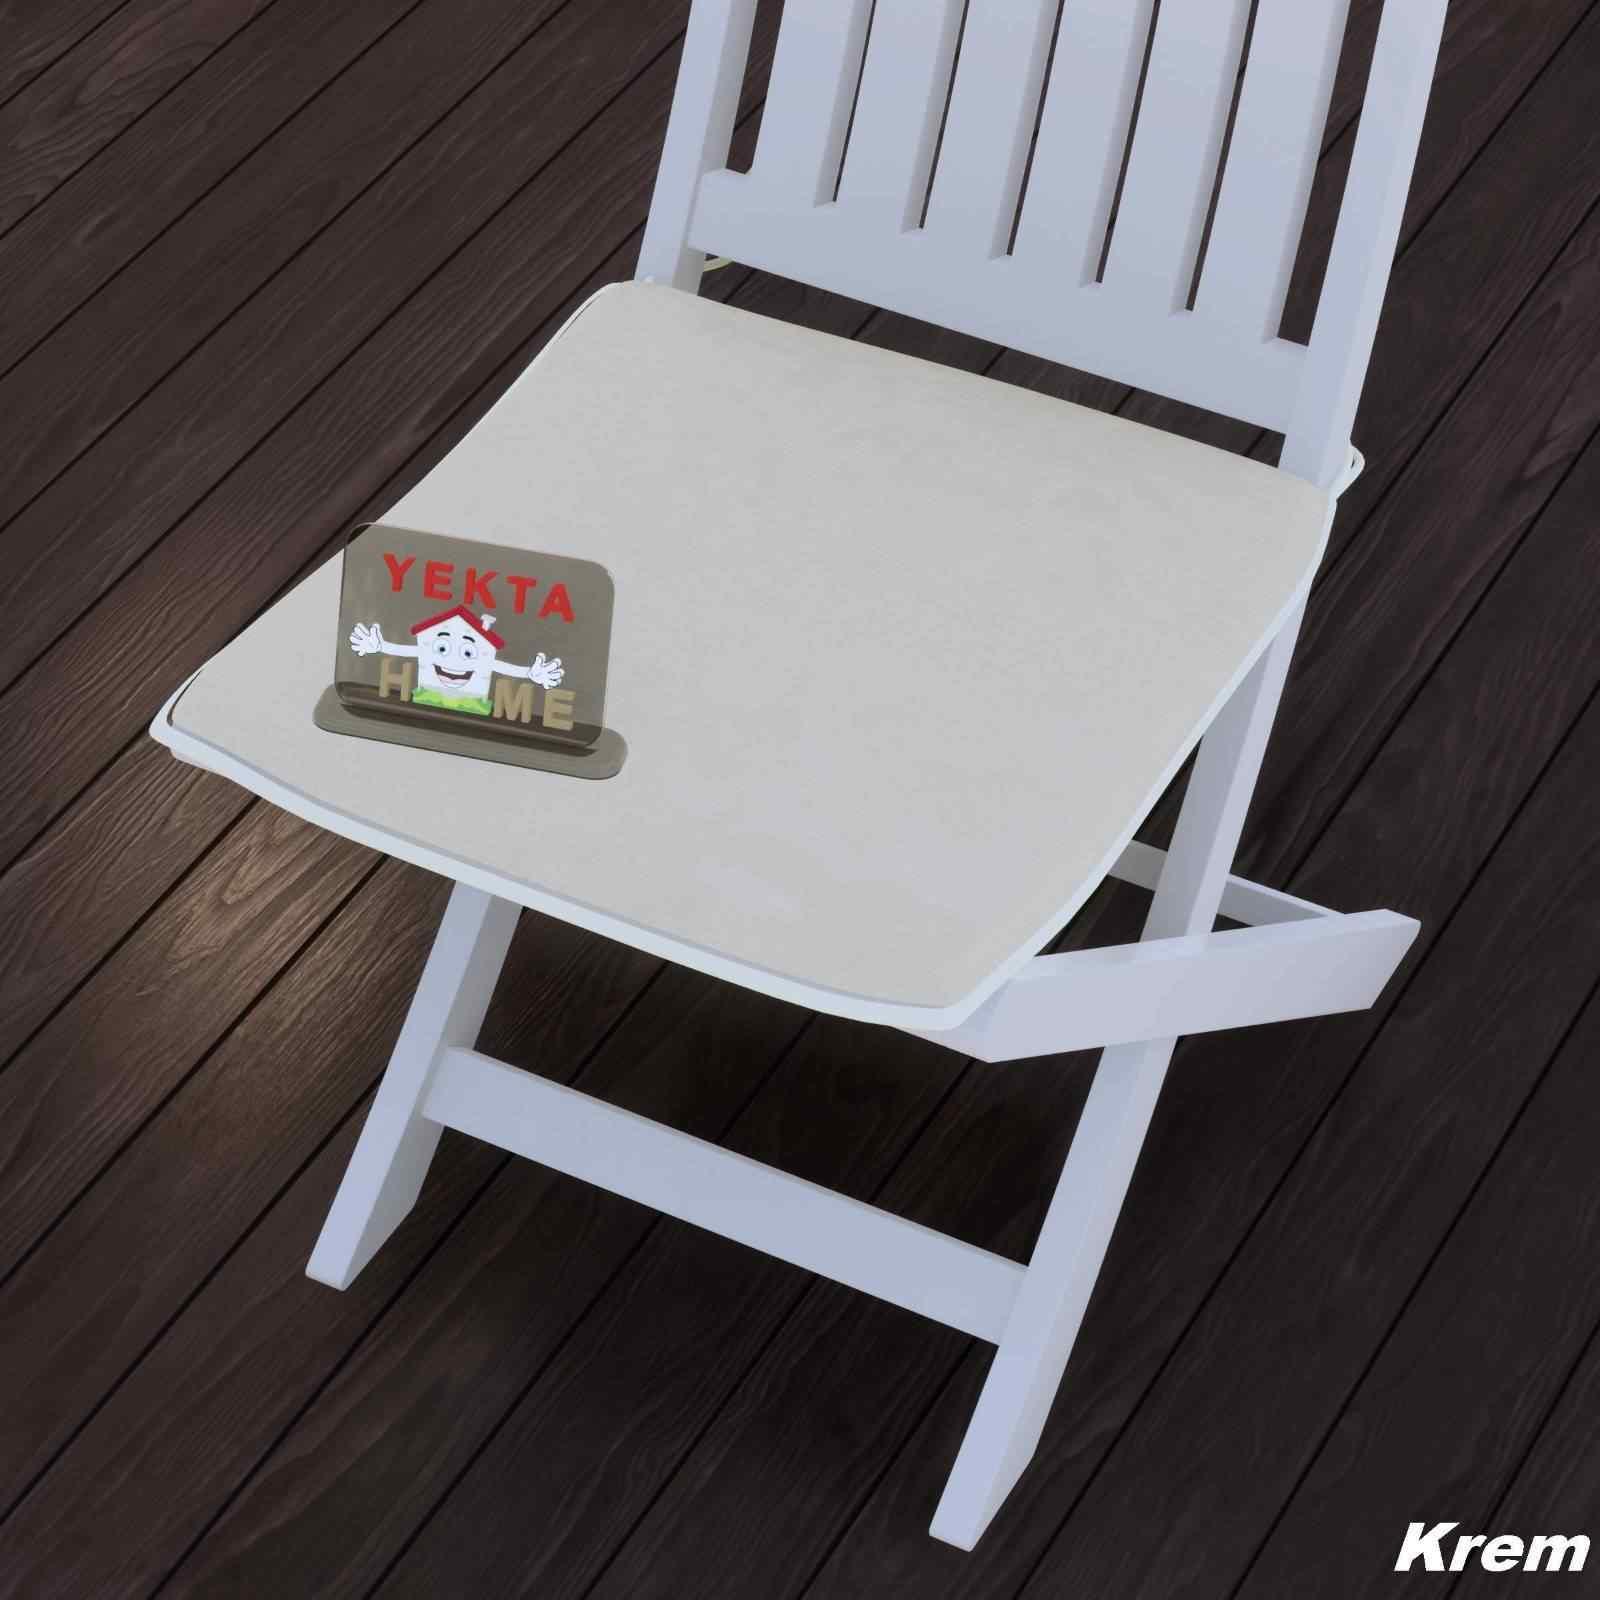 Sandalye Minderi - Rattan Koltuk Minderi 6 Adet Krem